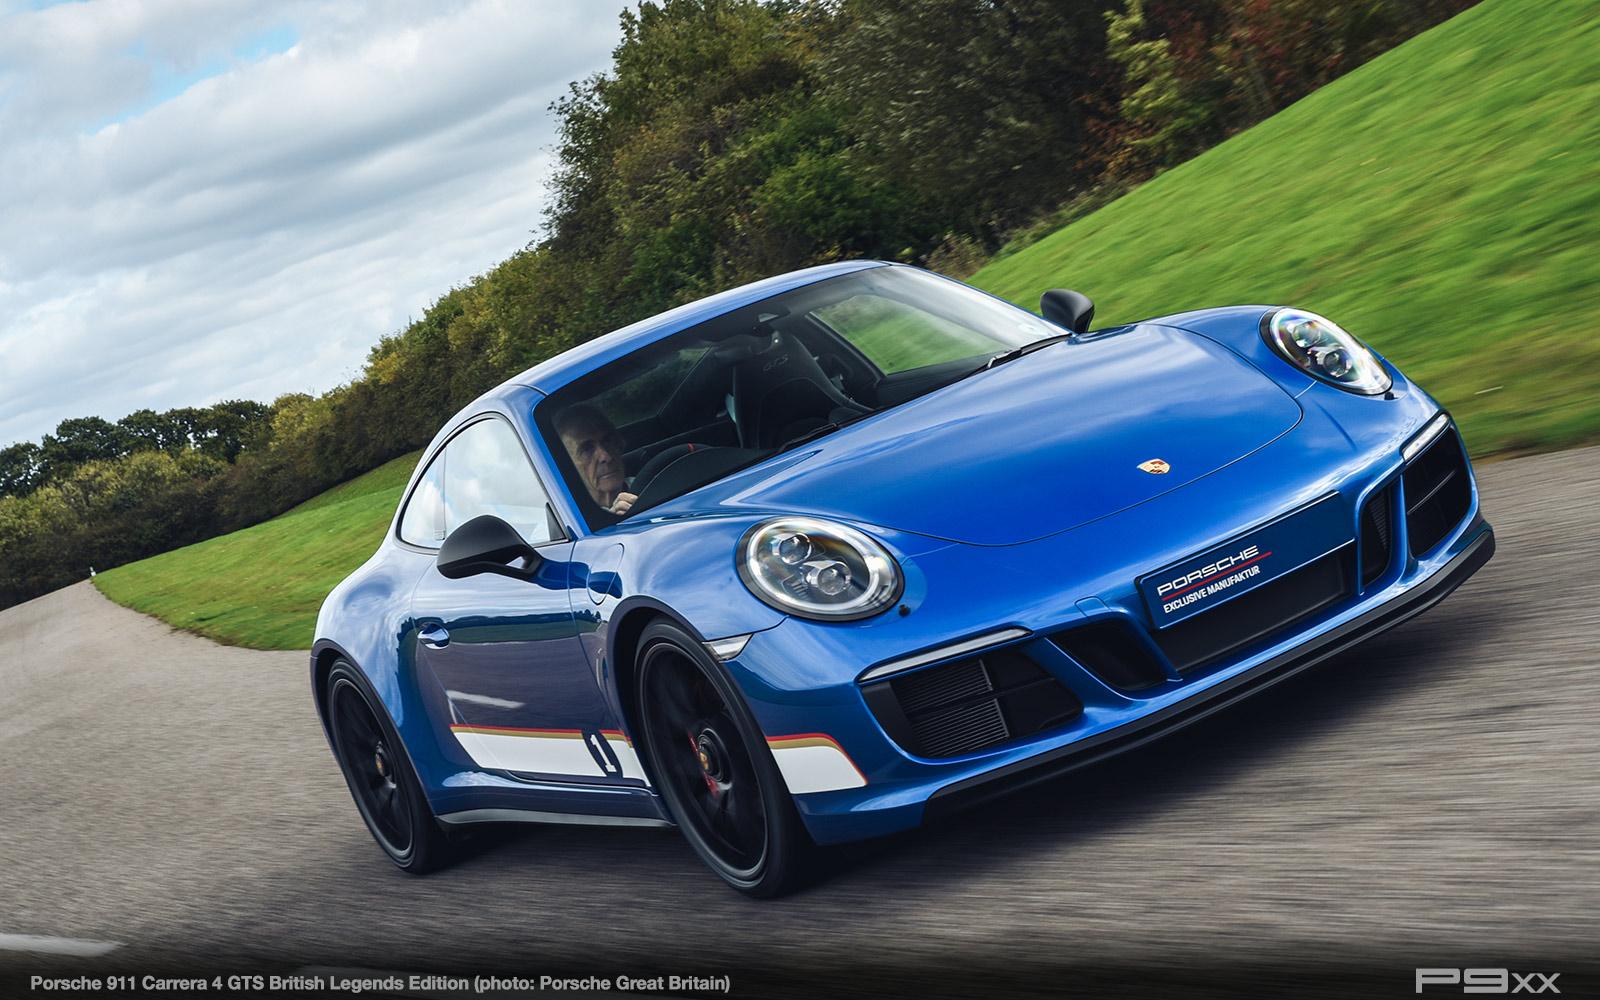 Porsche-911-Carrera-4-GTS-British-Legends-Edition-379